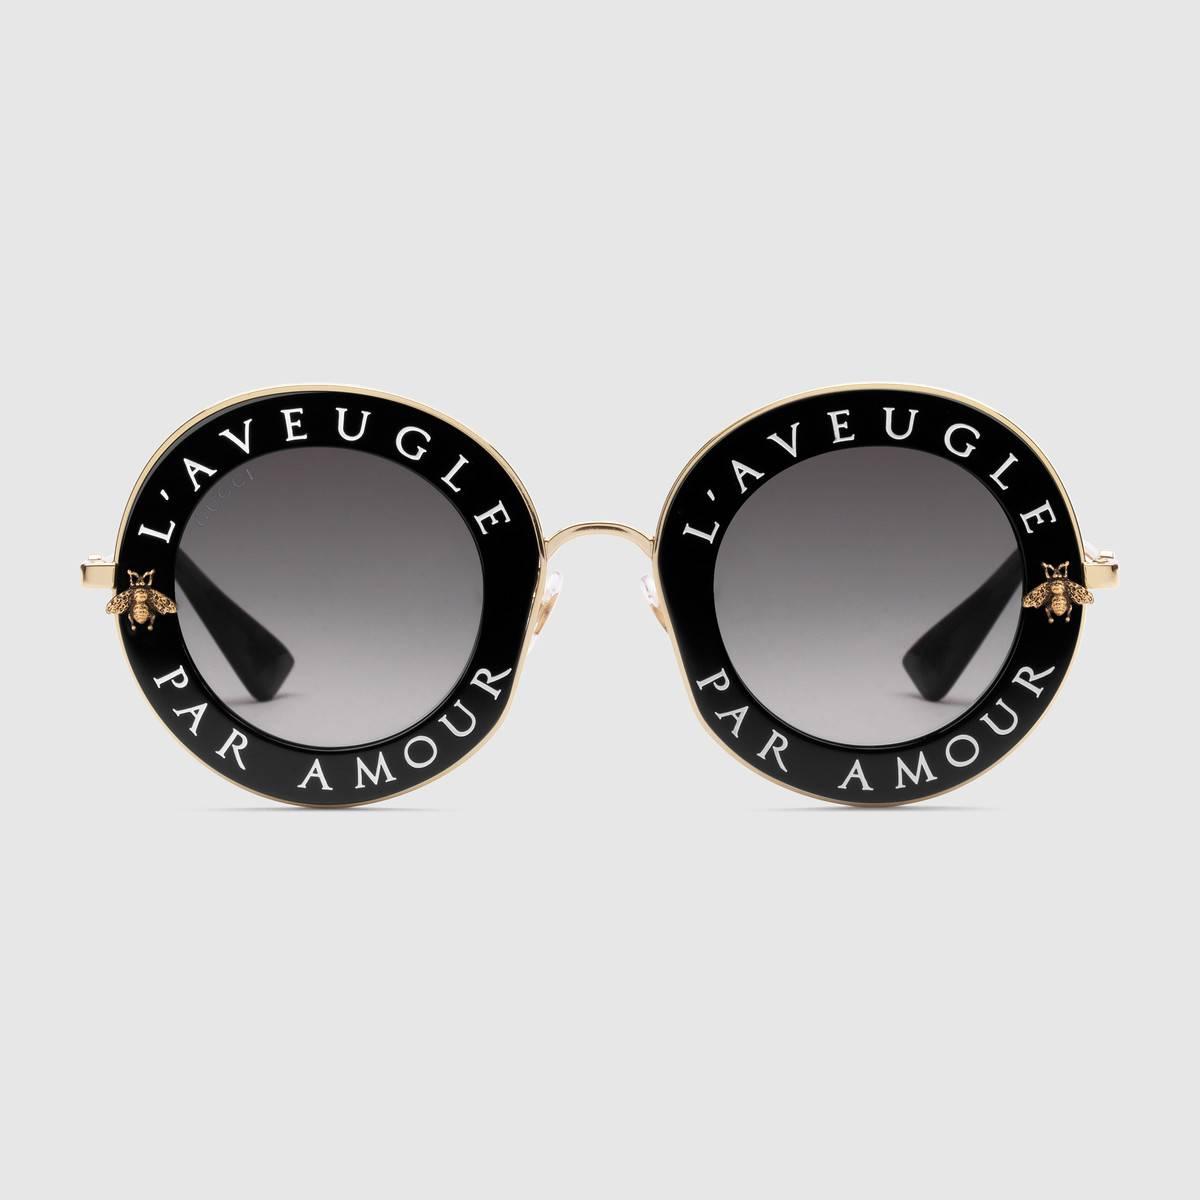 470459_I3330_1801_001_100_0000_Light-Round-frame-metal-sunglasses.jpg